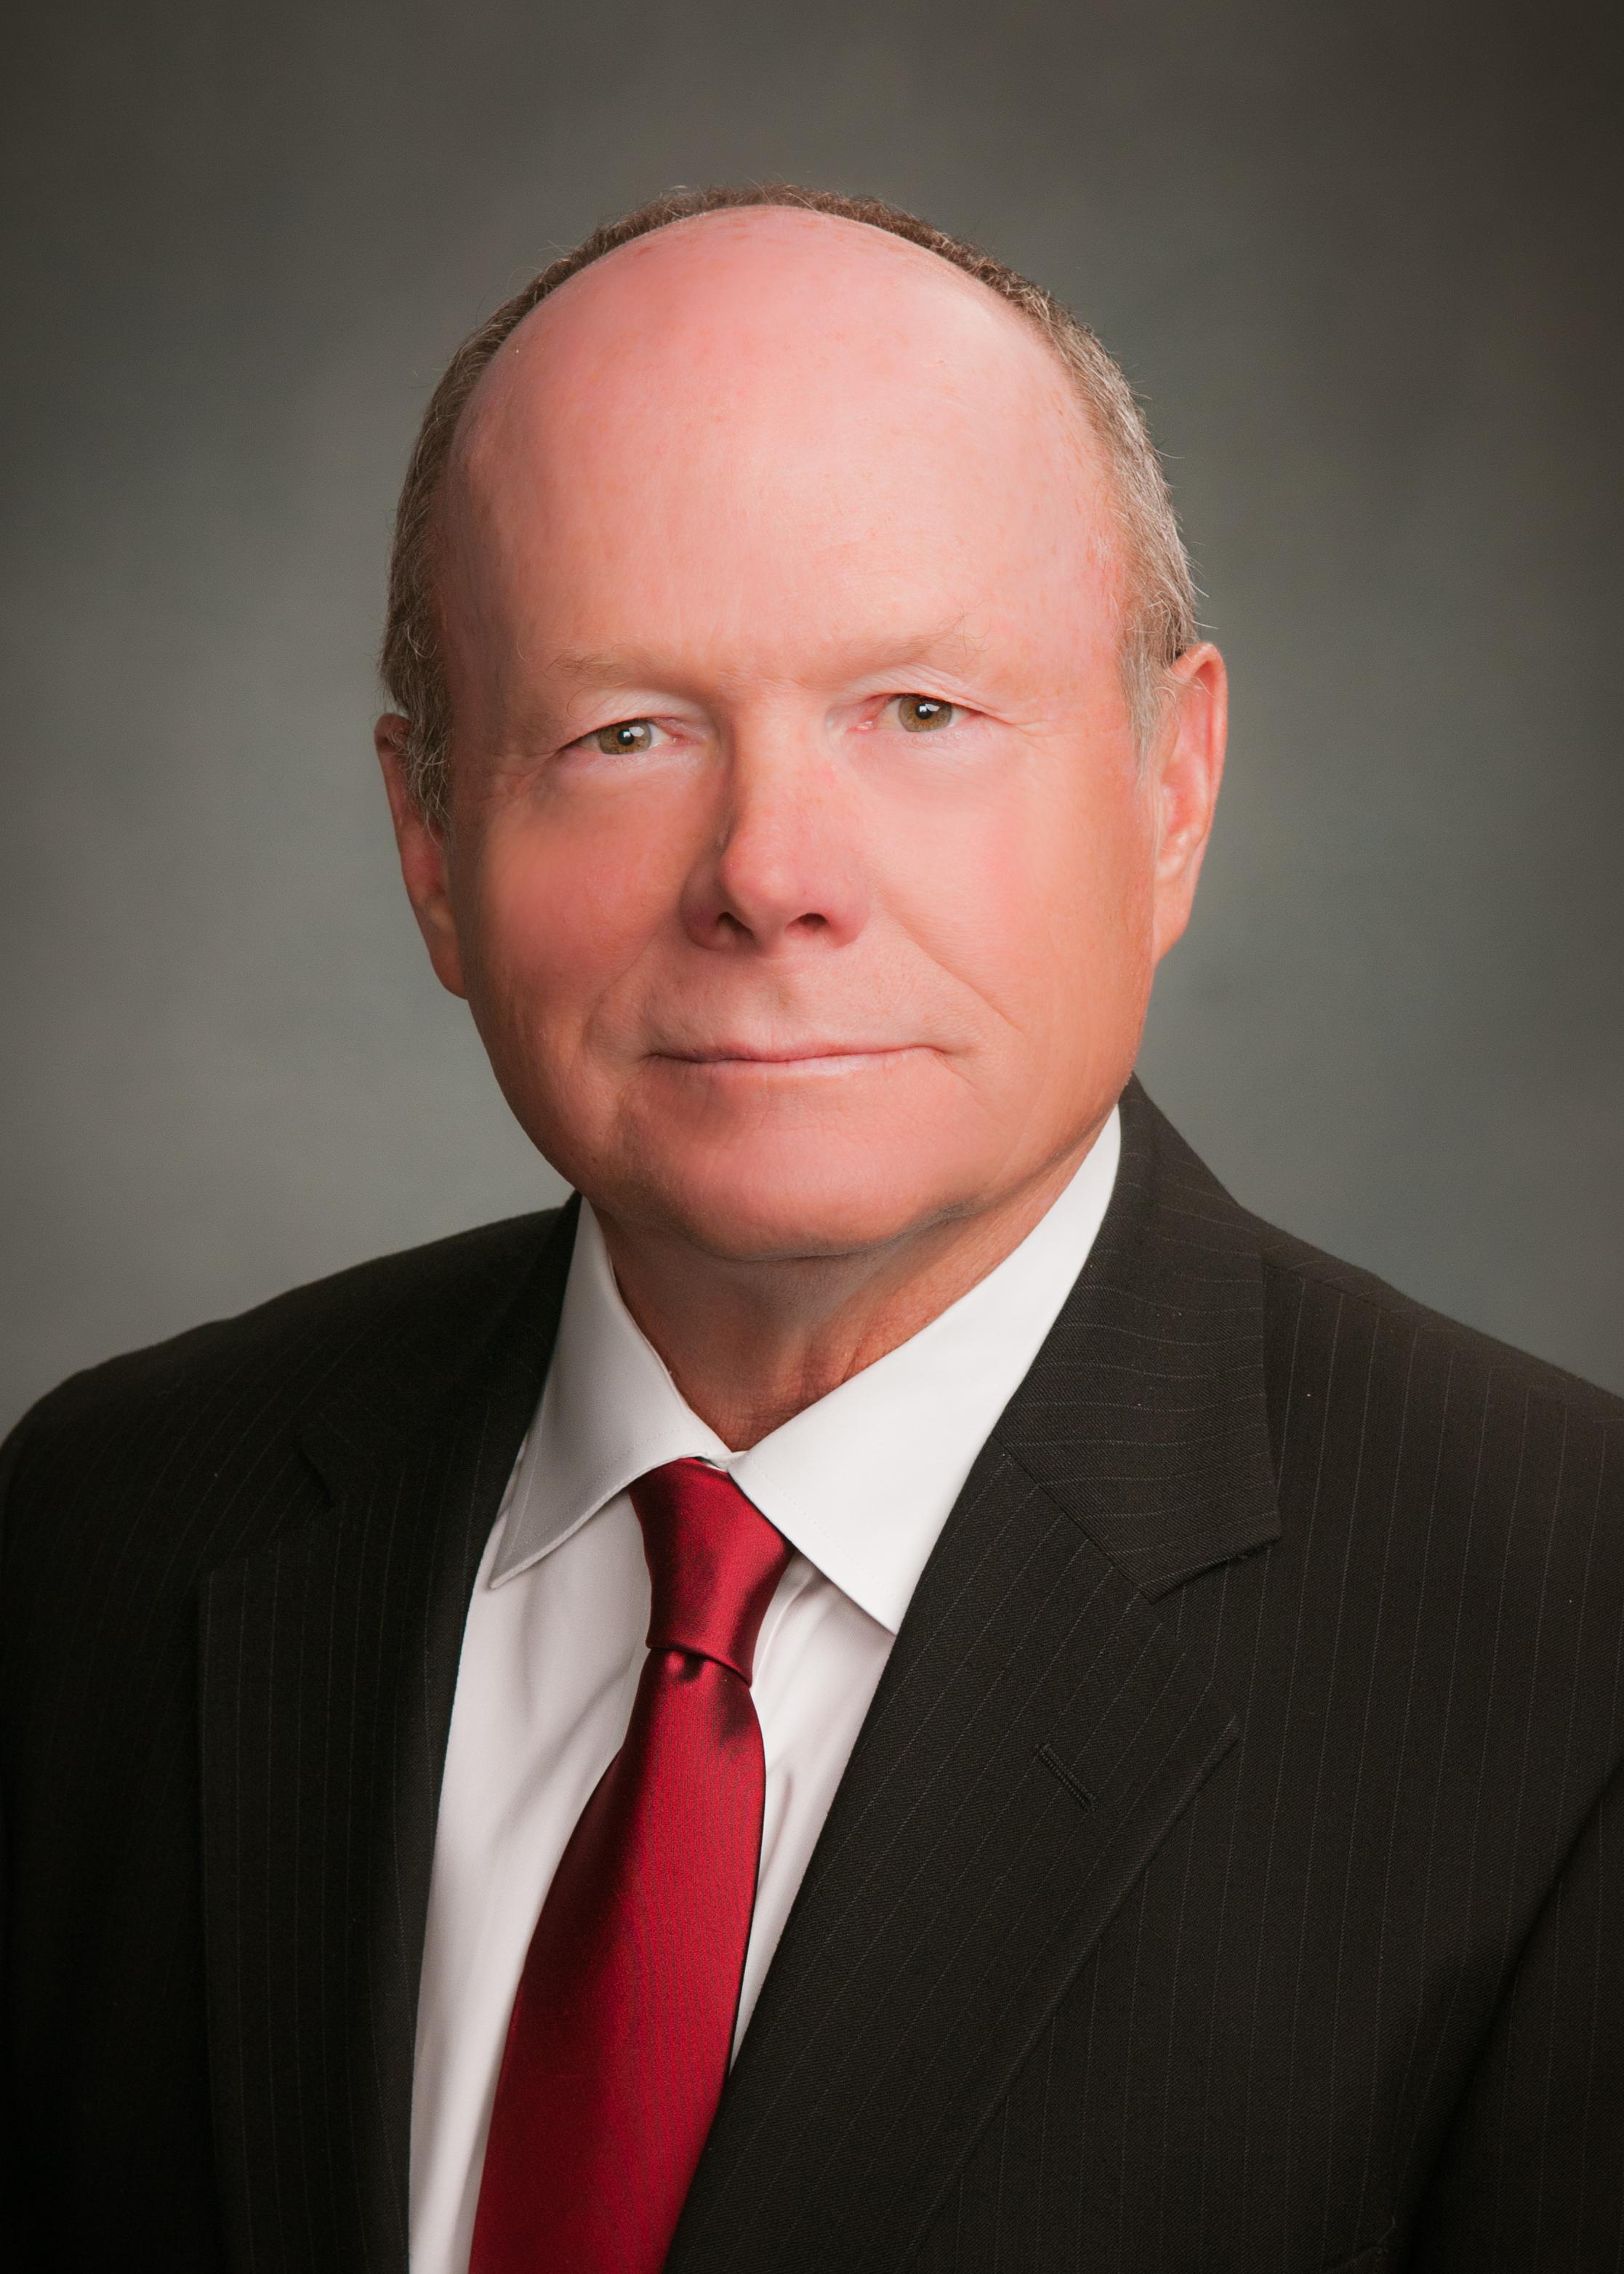 Stephen T. Whitehouse